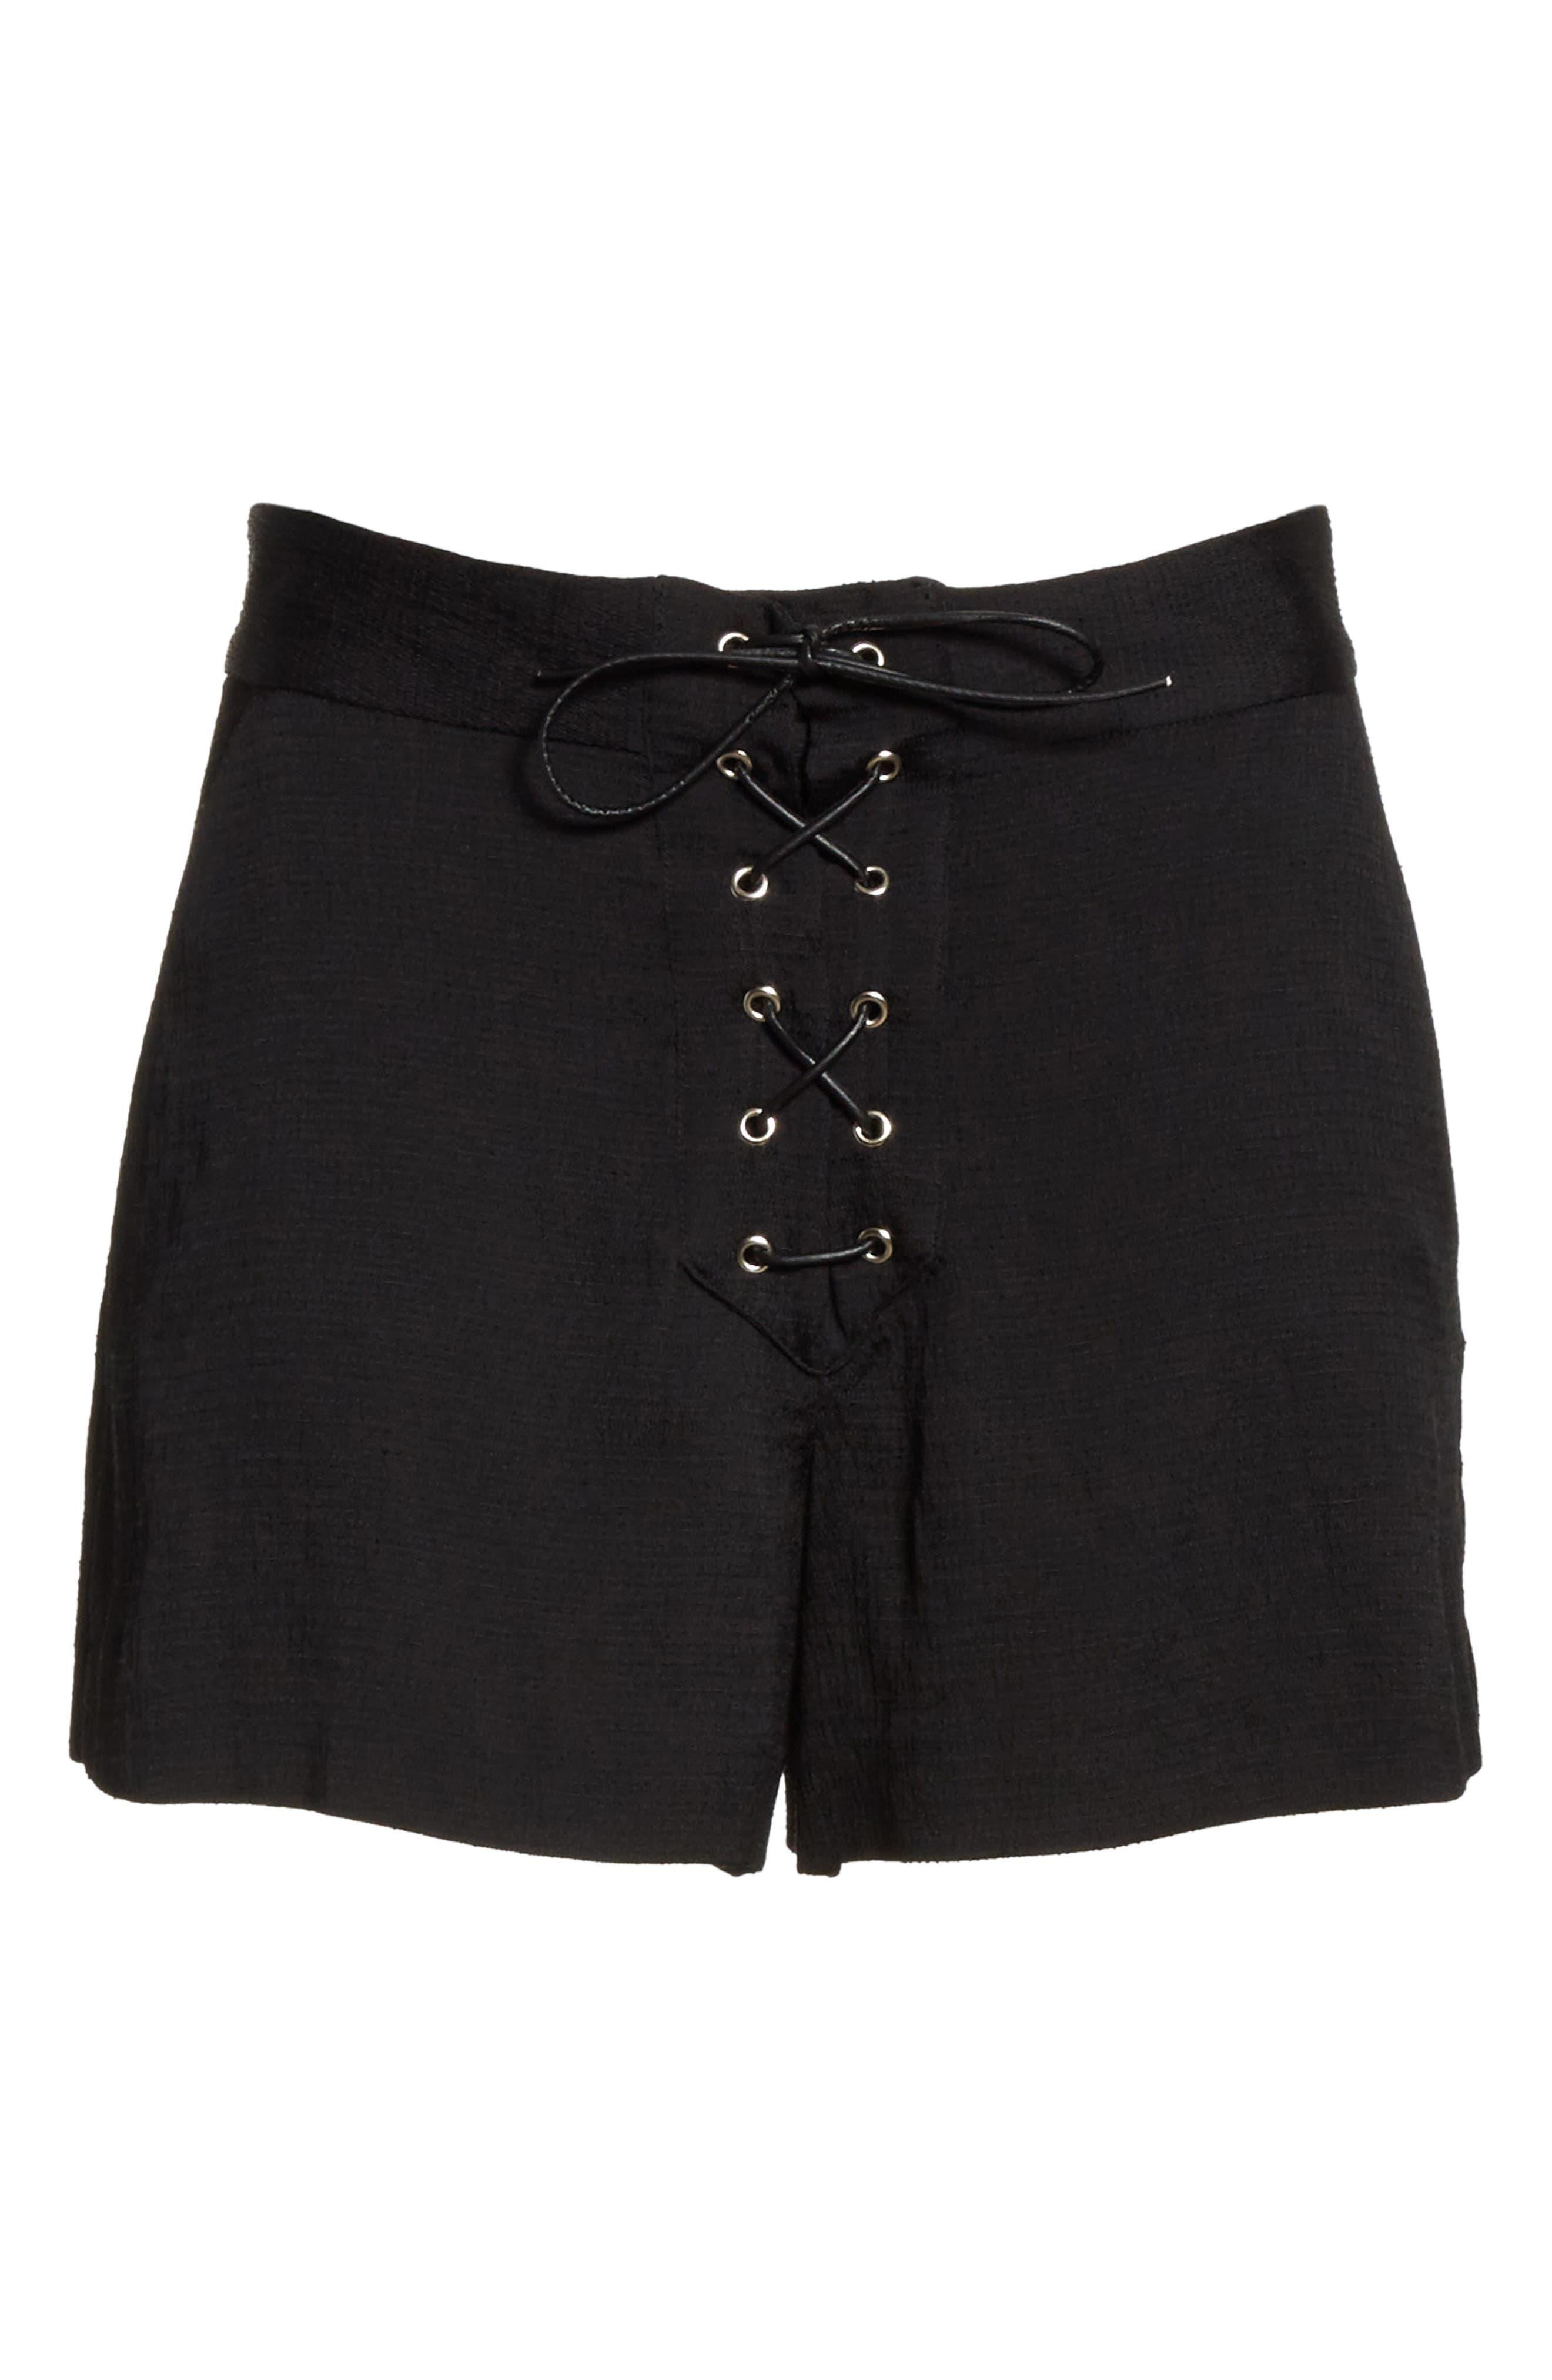 Lulu Lace-Up Shorts,                             Alternate thumbnail 6, color,                             001